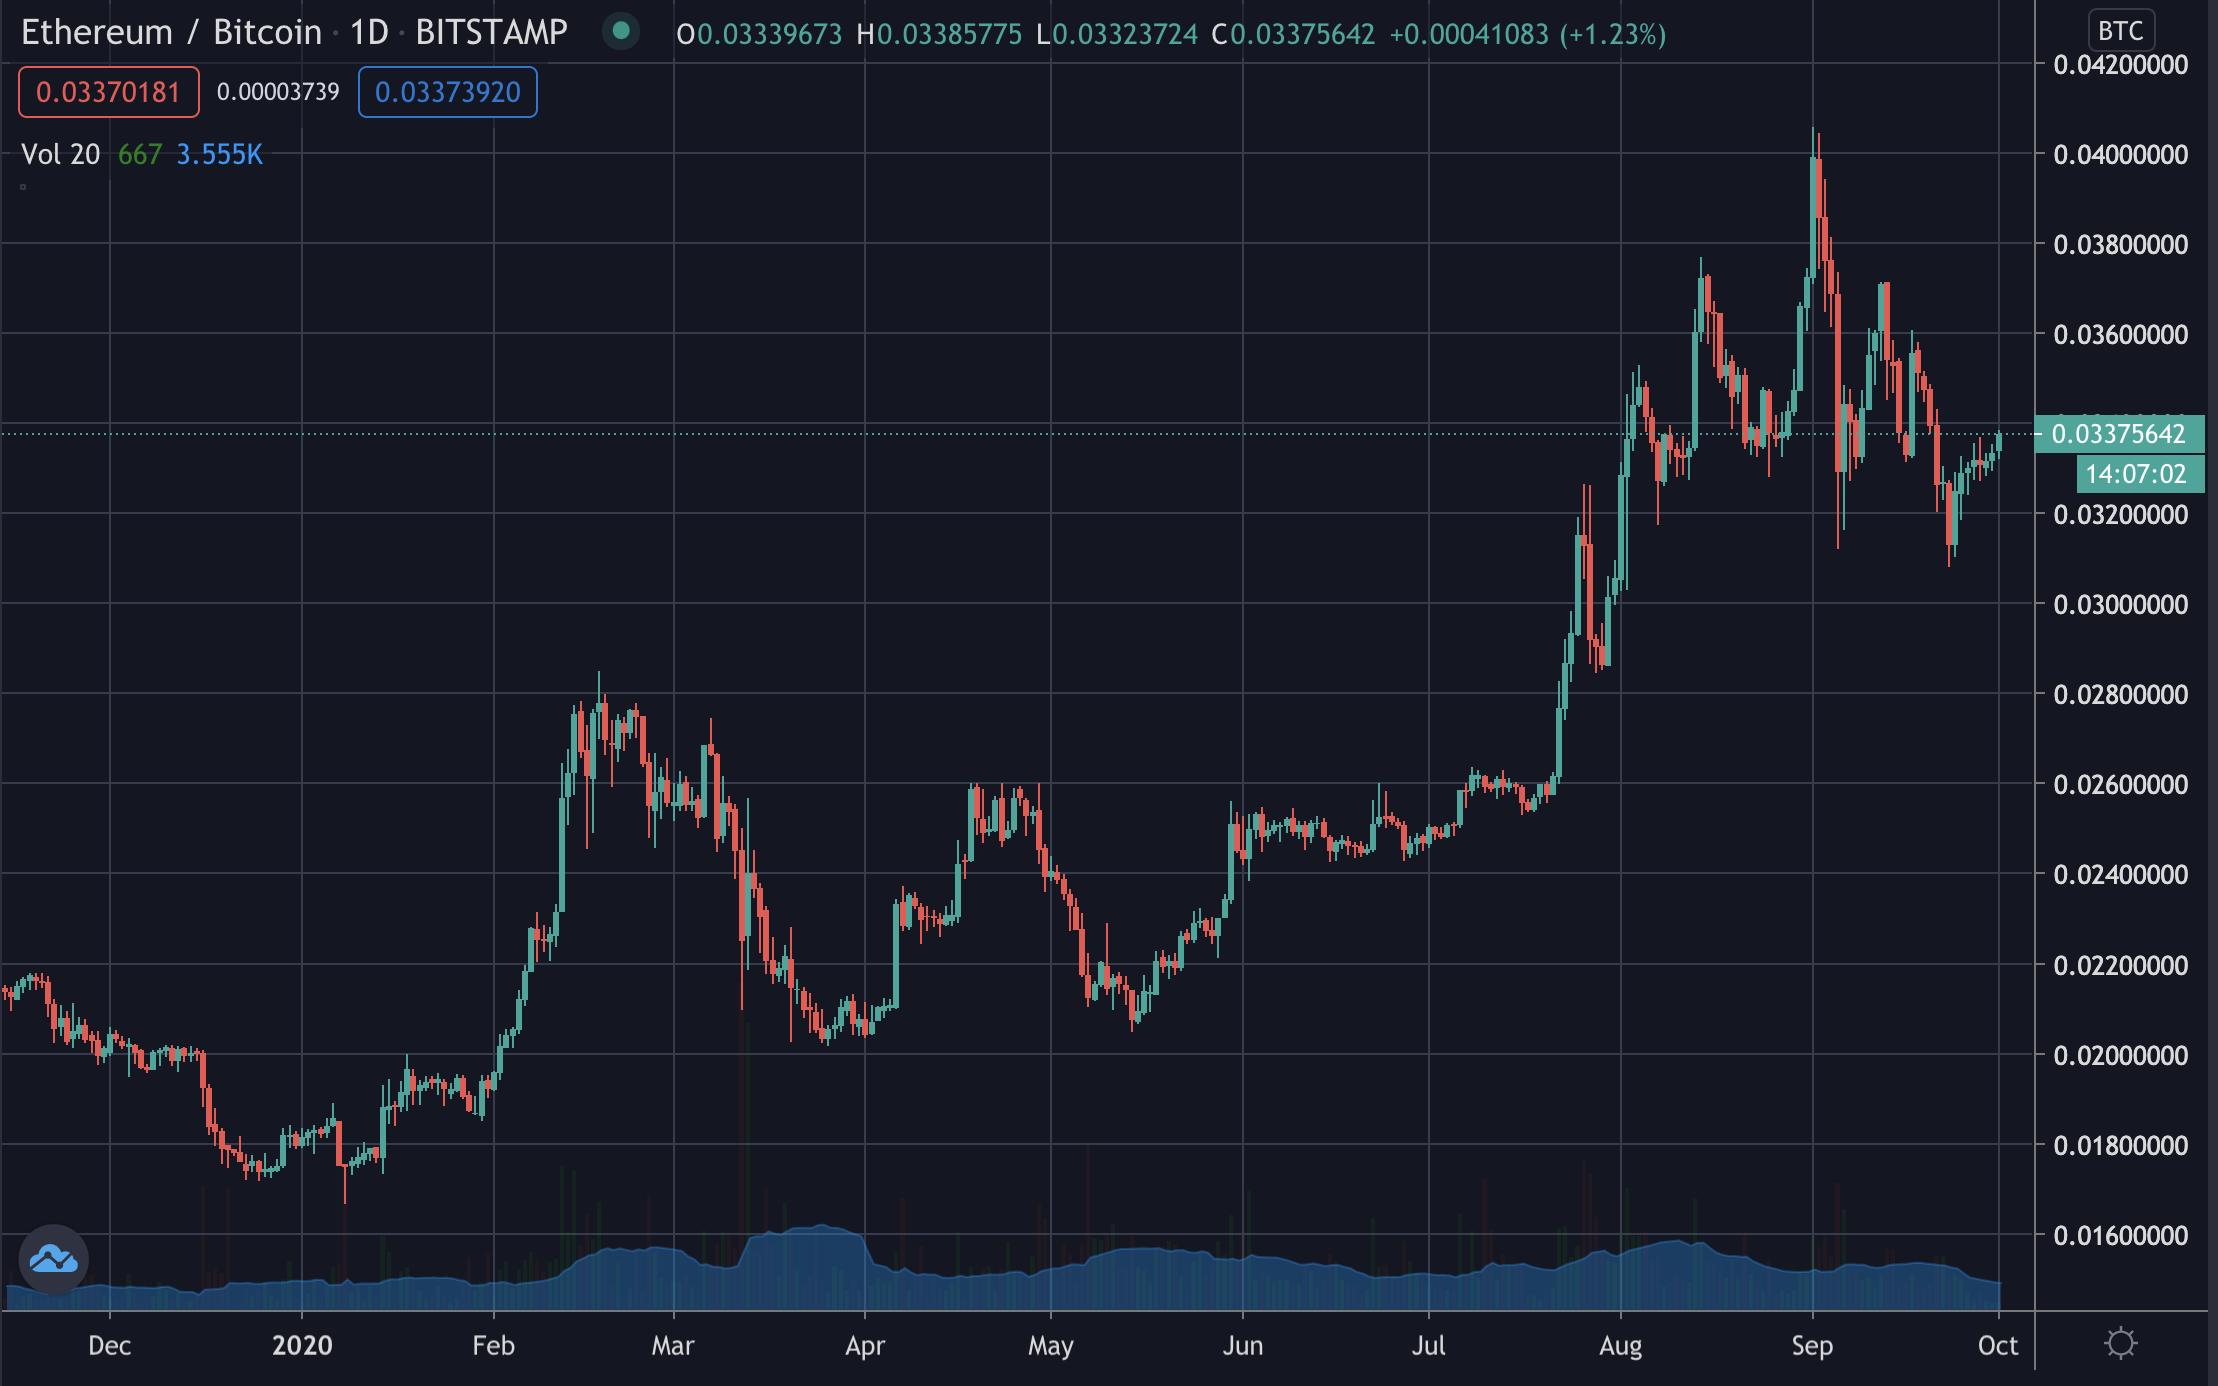 Ethereum bitcoin price, Oct 2020